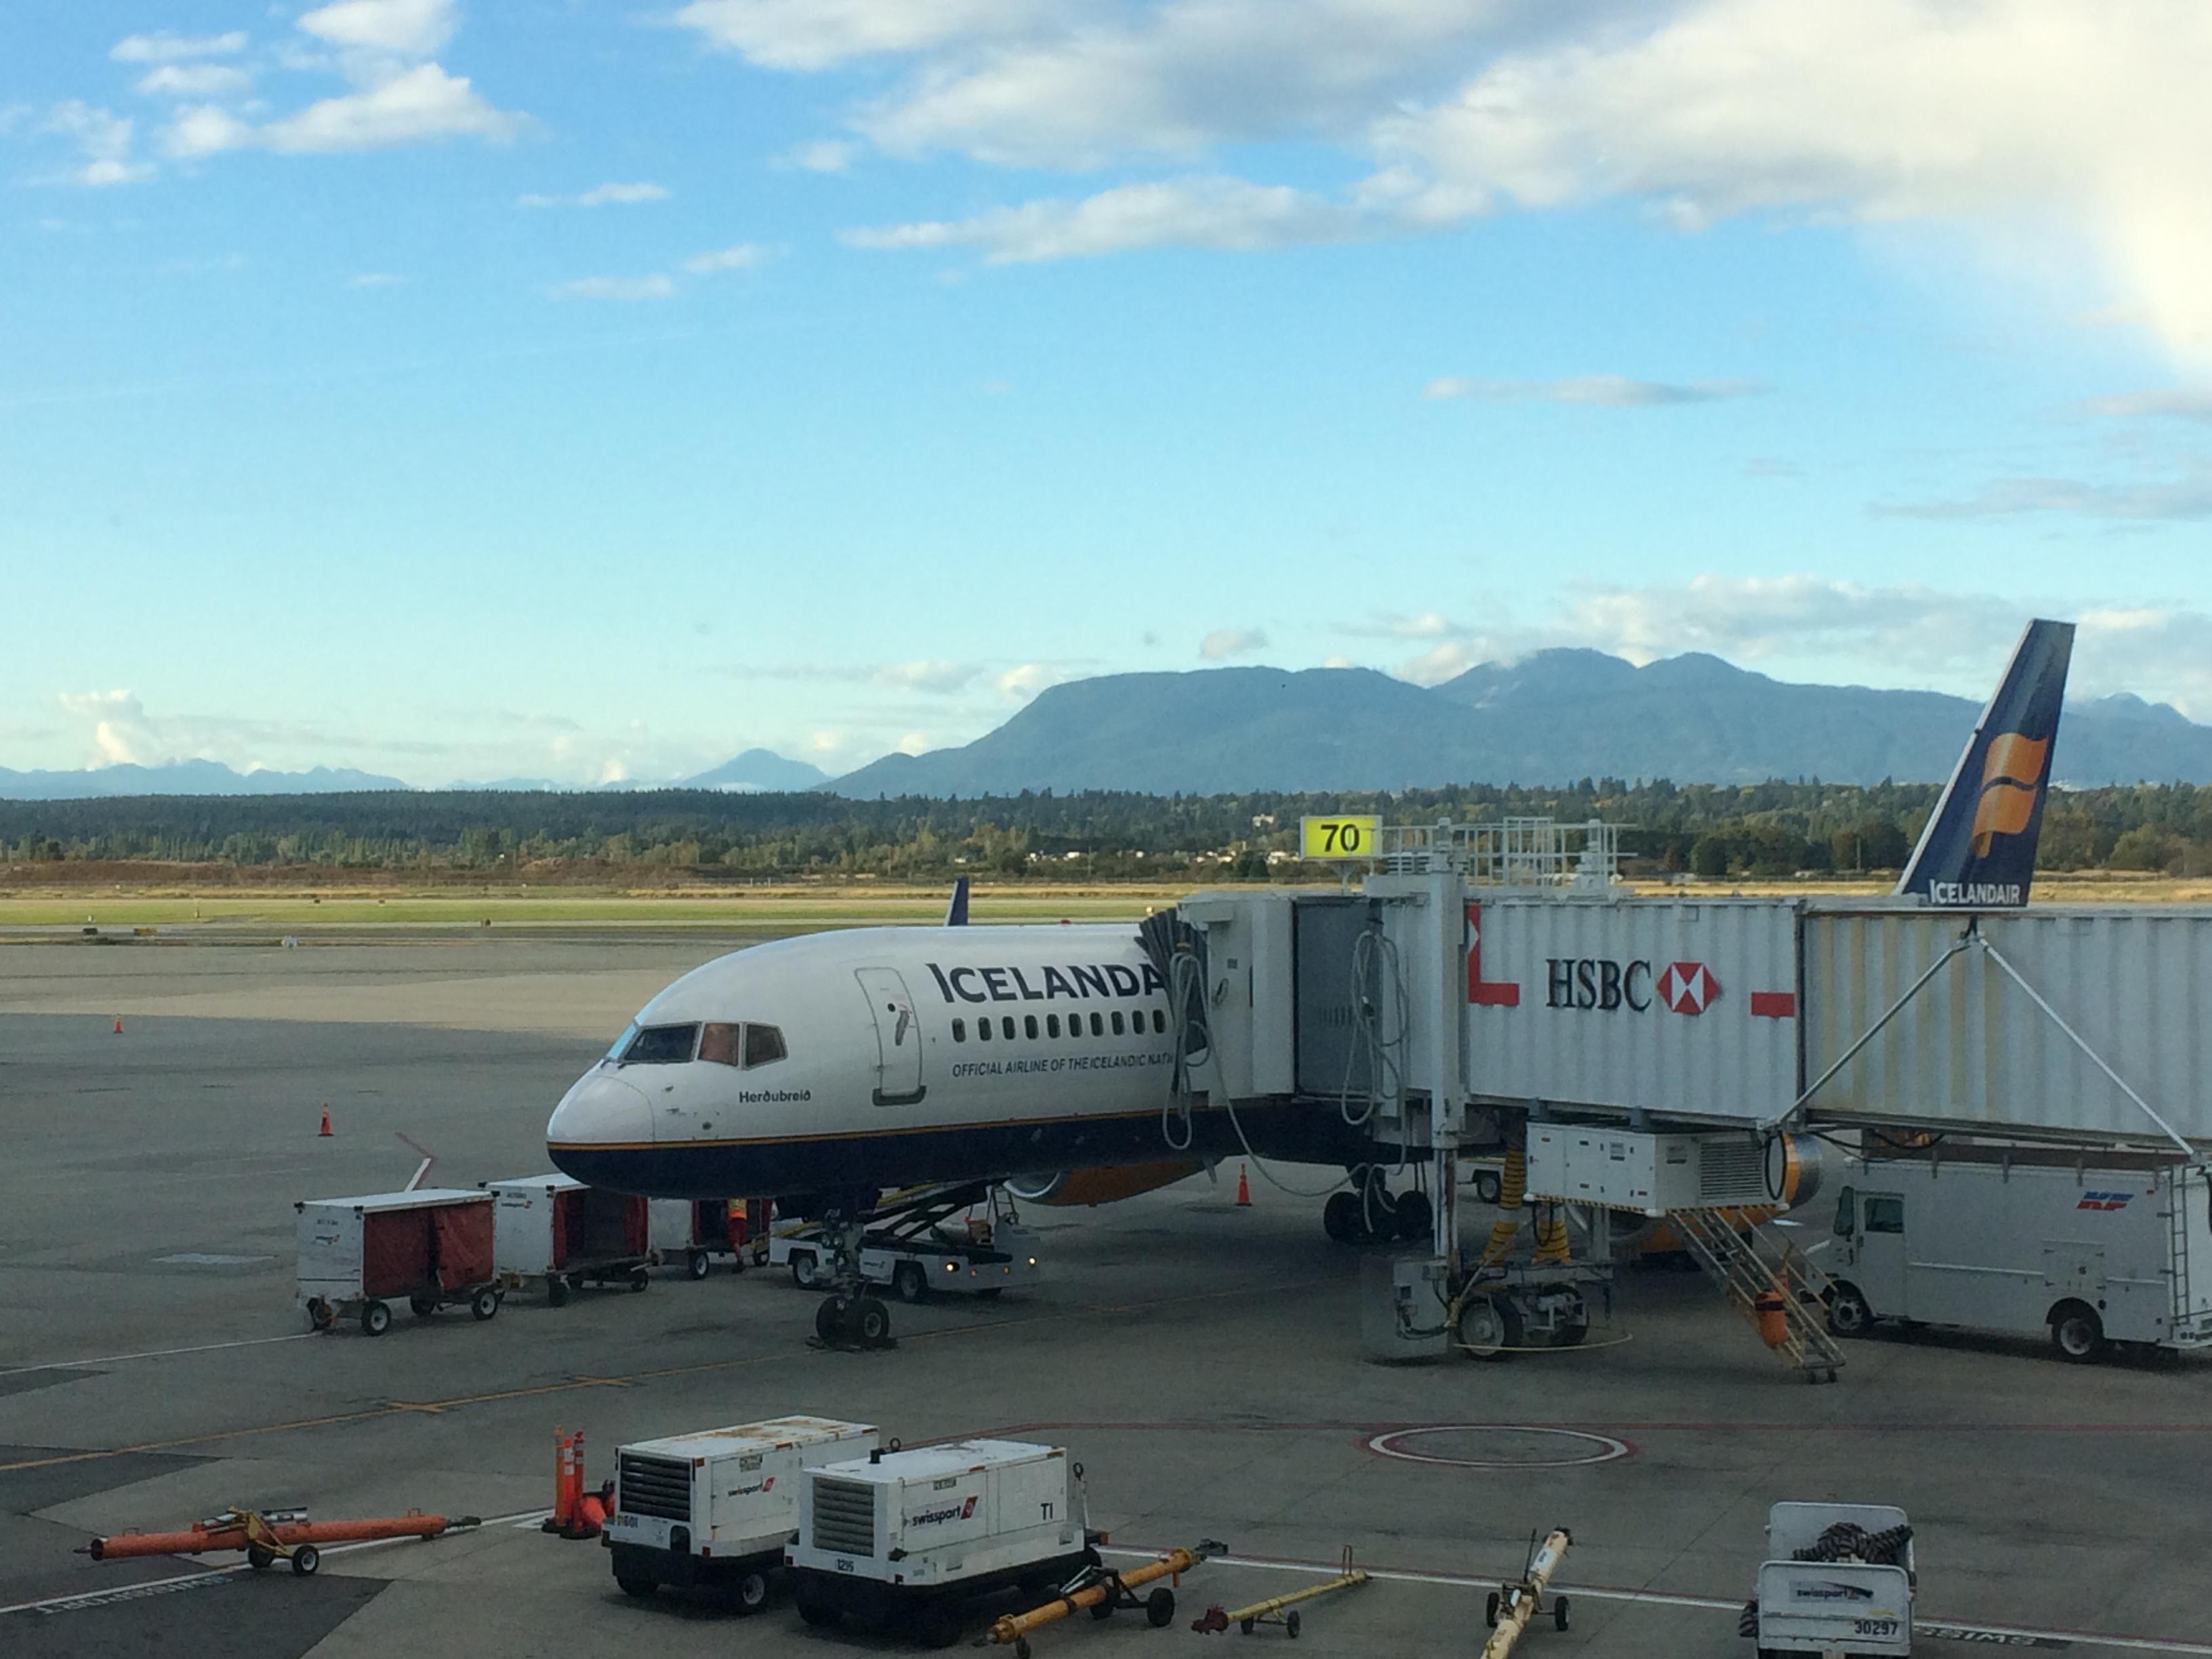 gepäck brussels airline